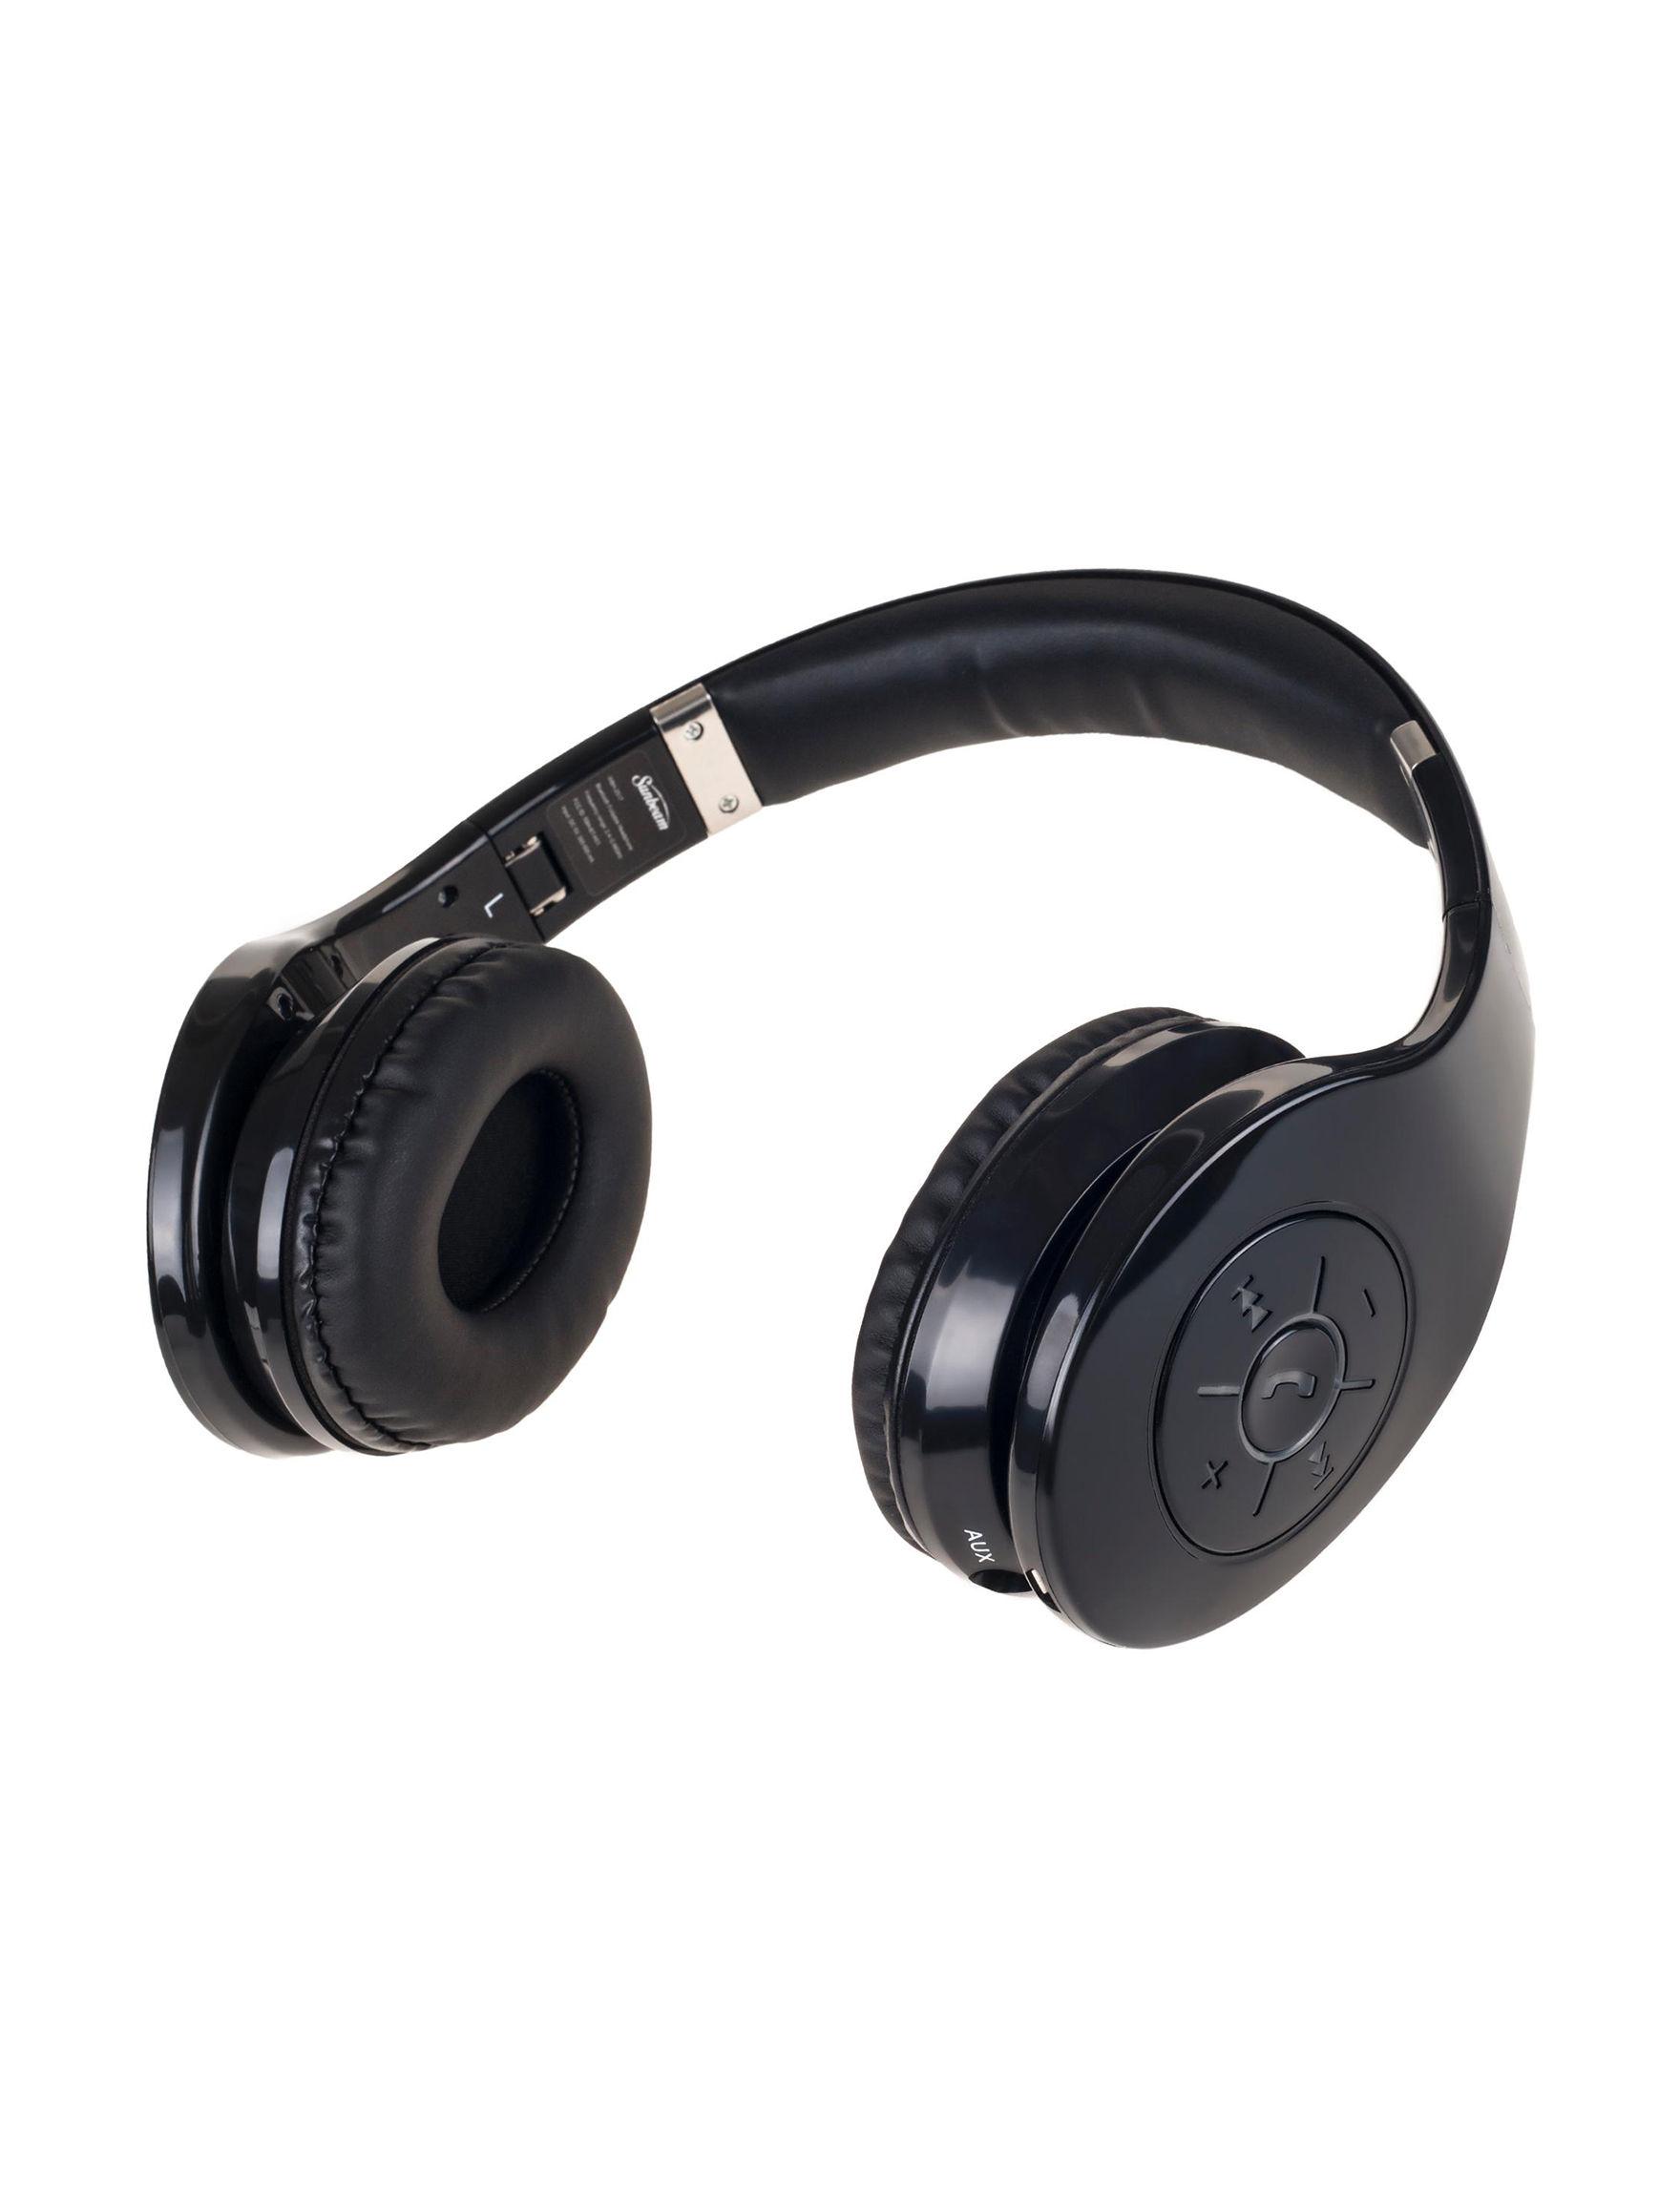 Sunbeam Black Headphones Home & Portable Audio